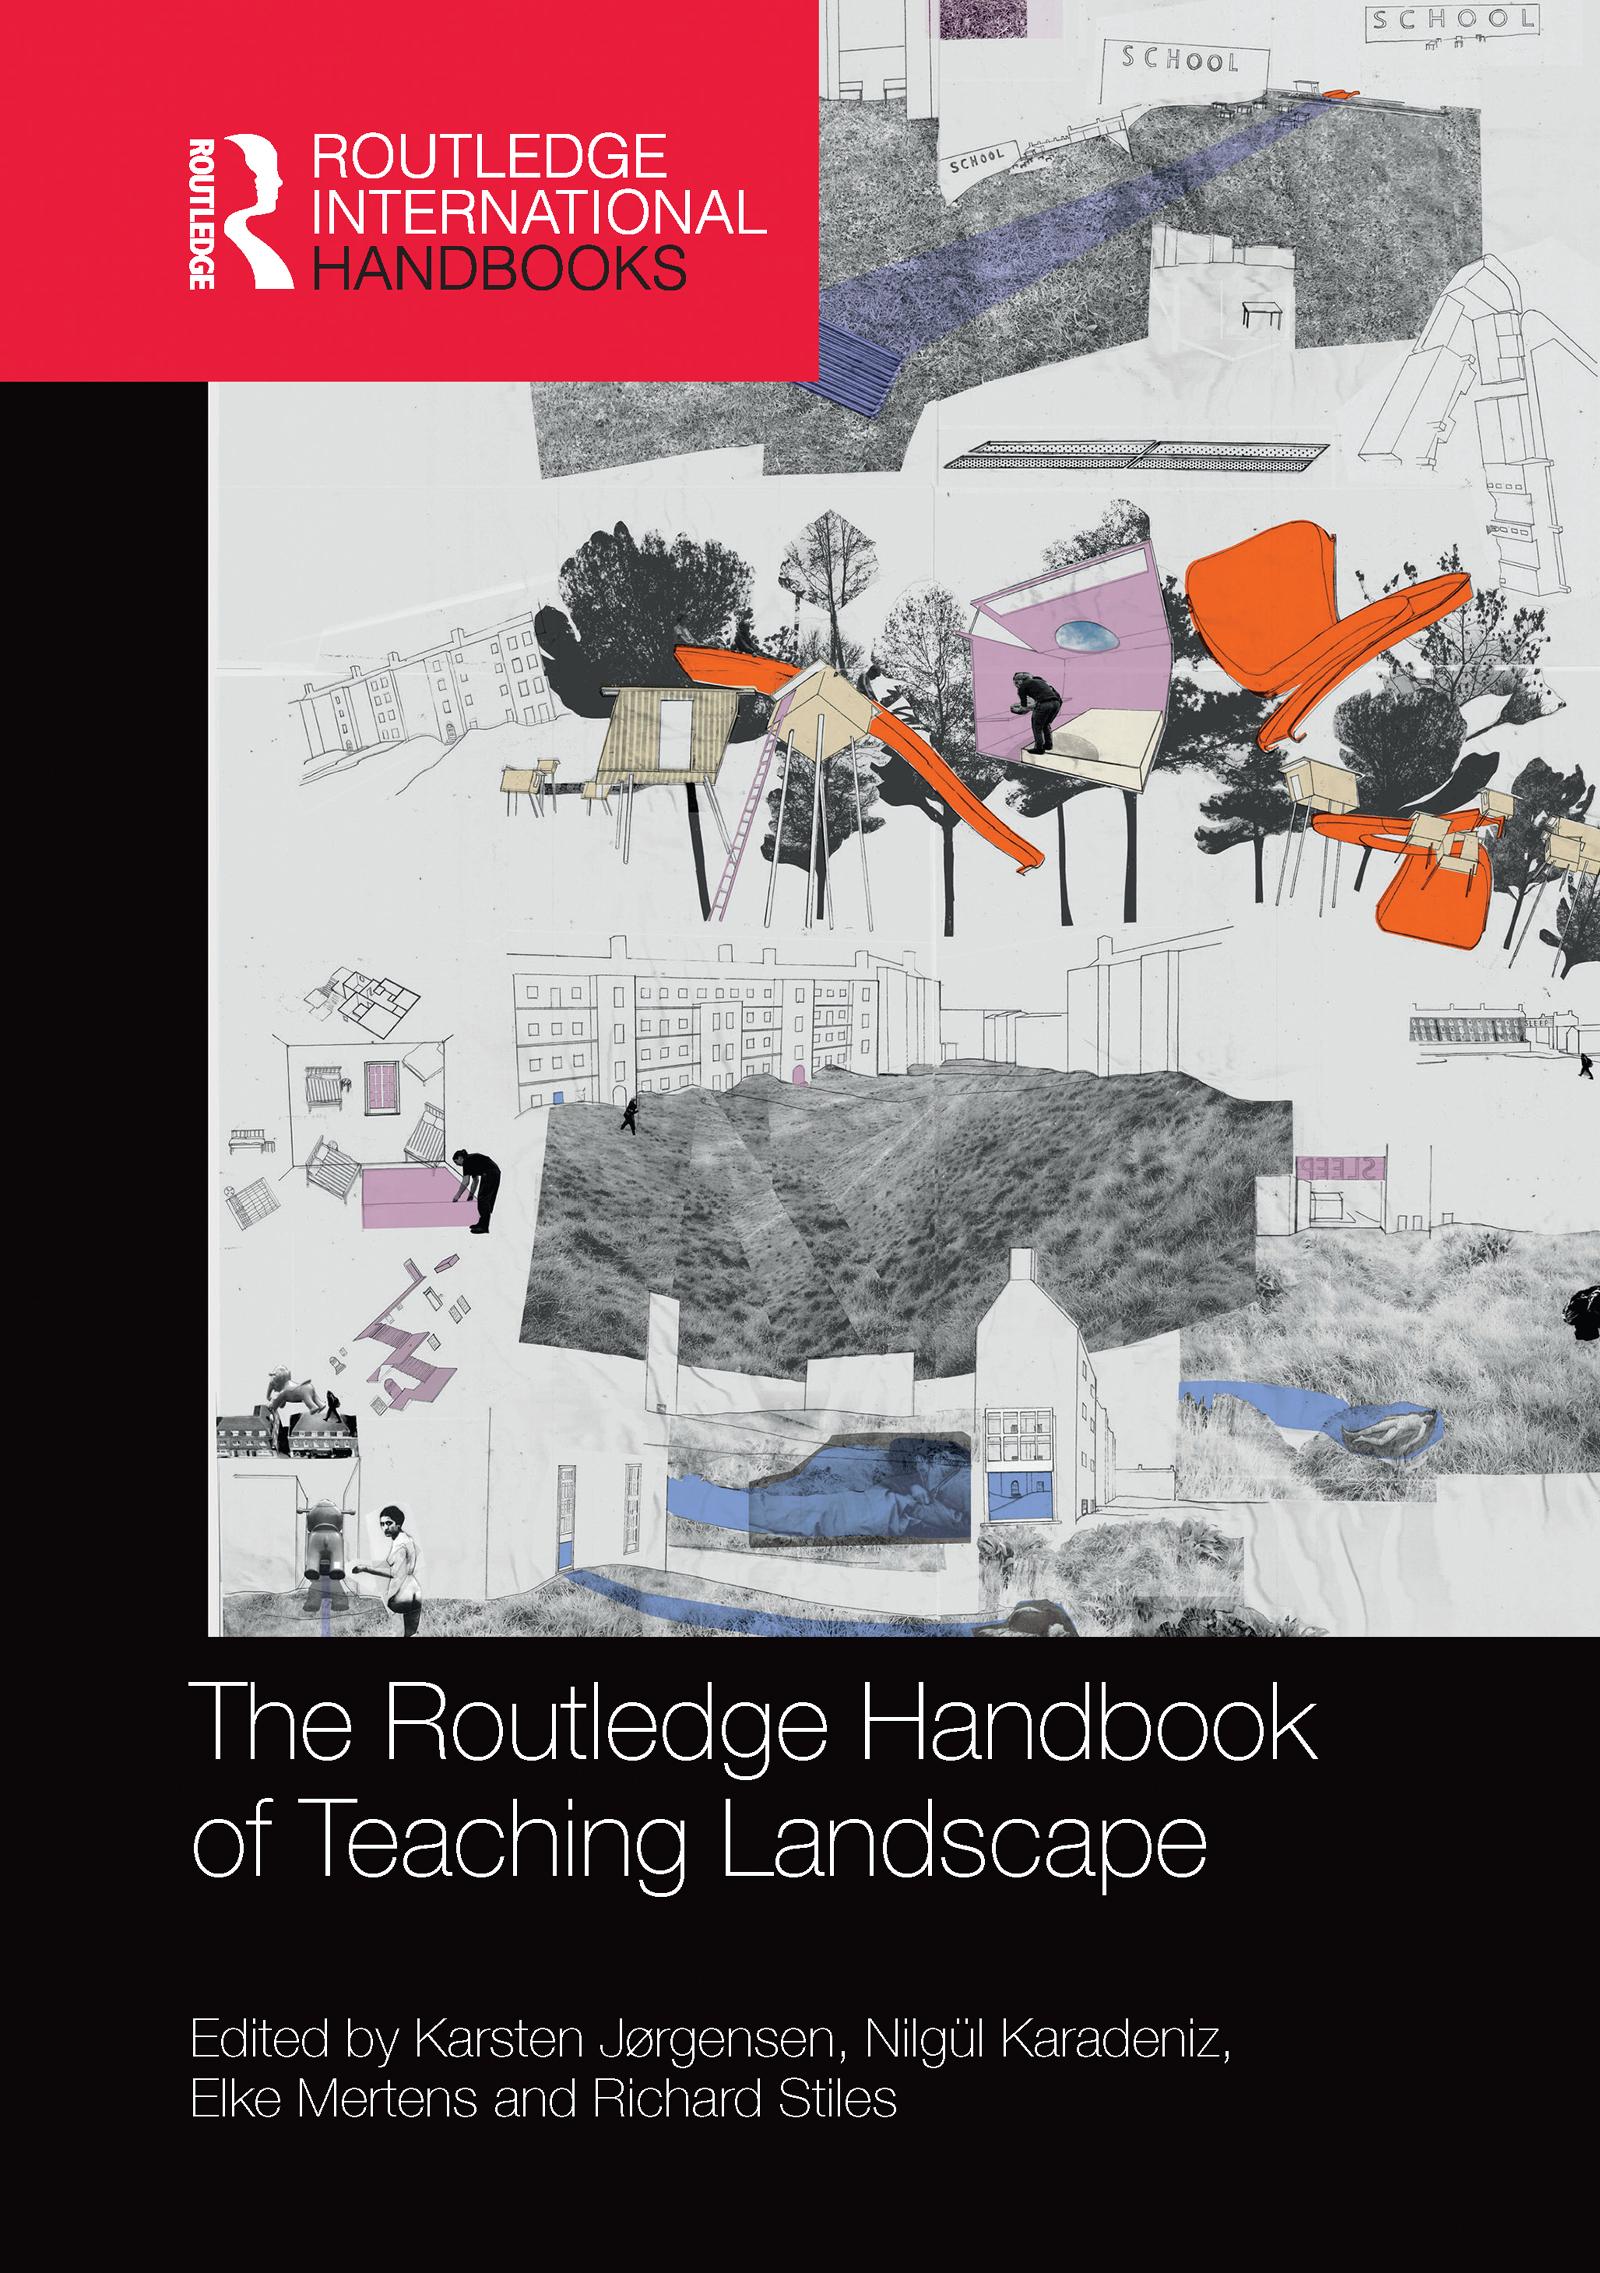 The Routledge Handbook of Teaching Landscape